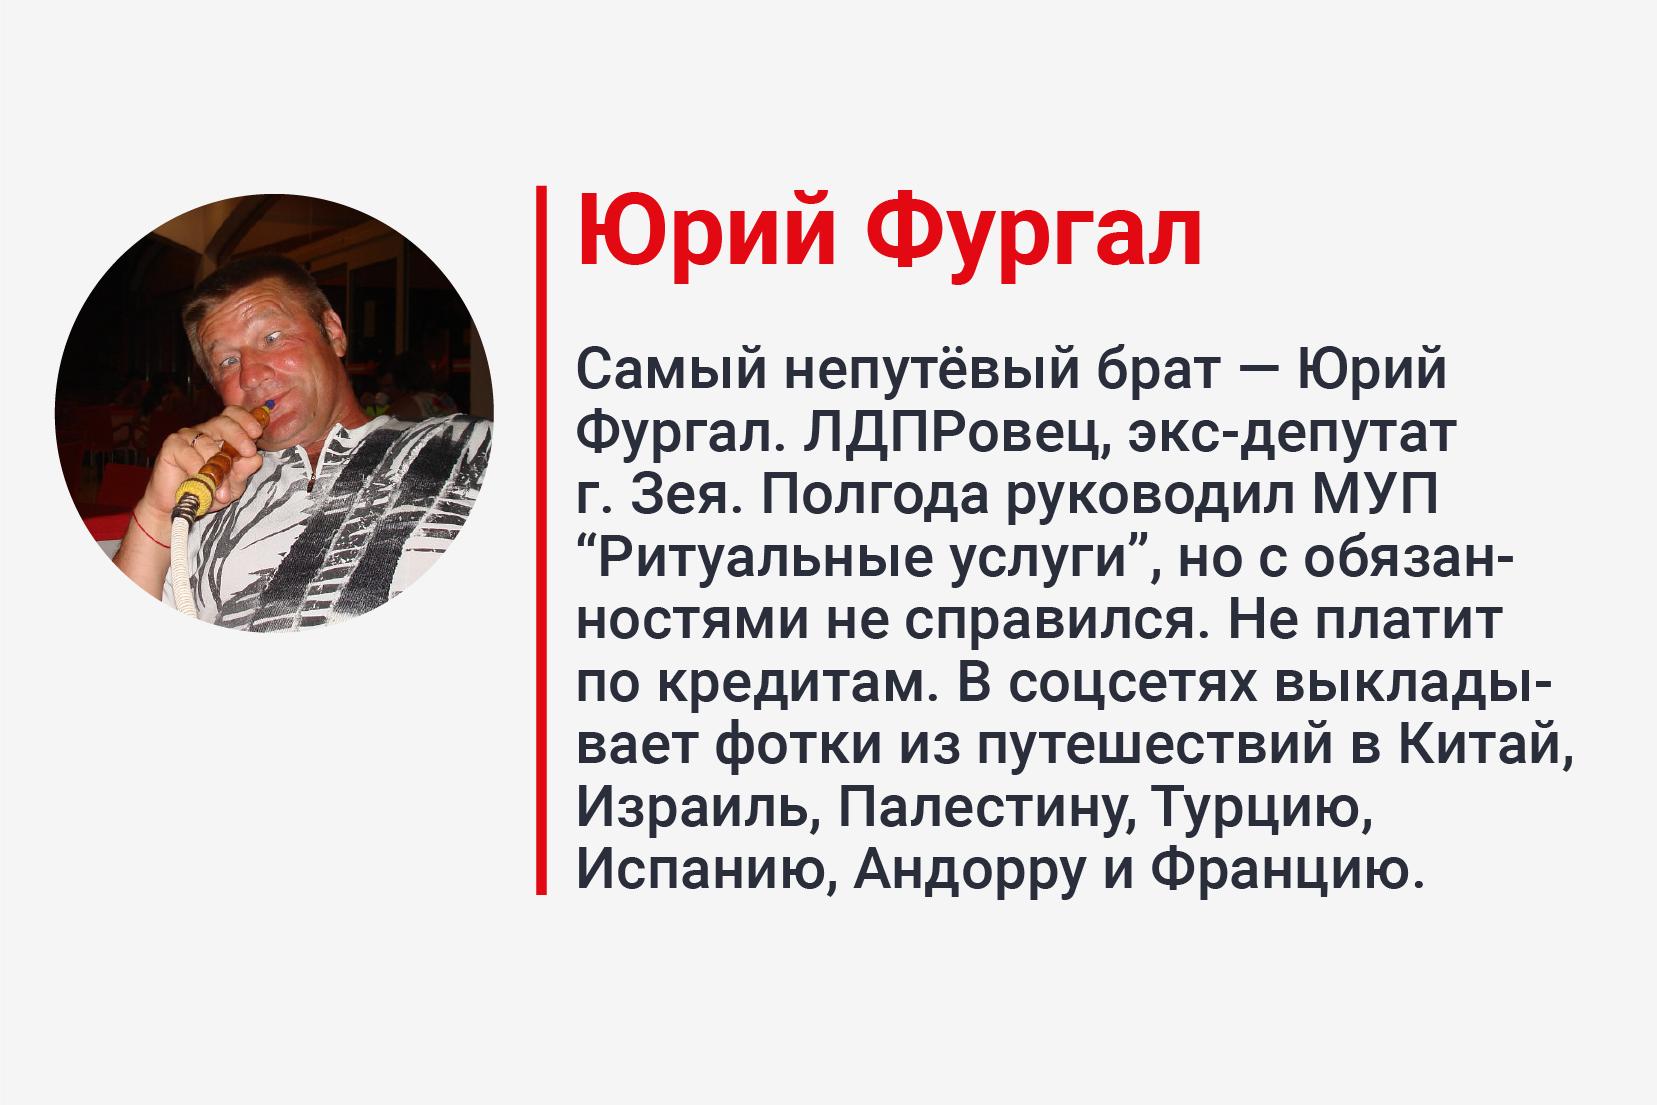 "<p>Фото © <a href=""https://ok.ru/profile/573013748512/pphotos/604041492256"" target=""_self"">OK / Юра Фургал</a></p>"